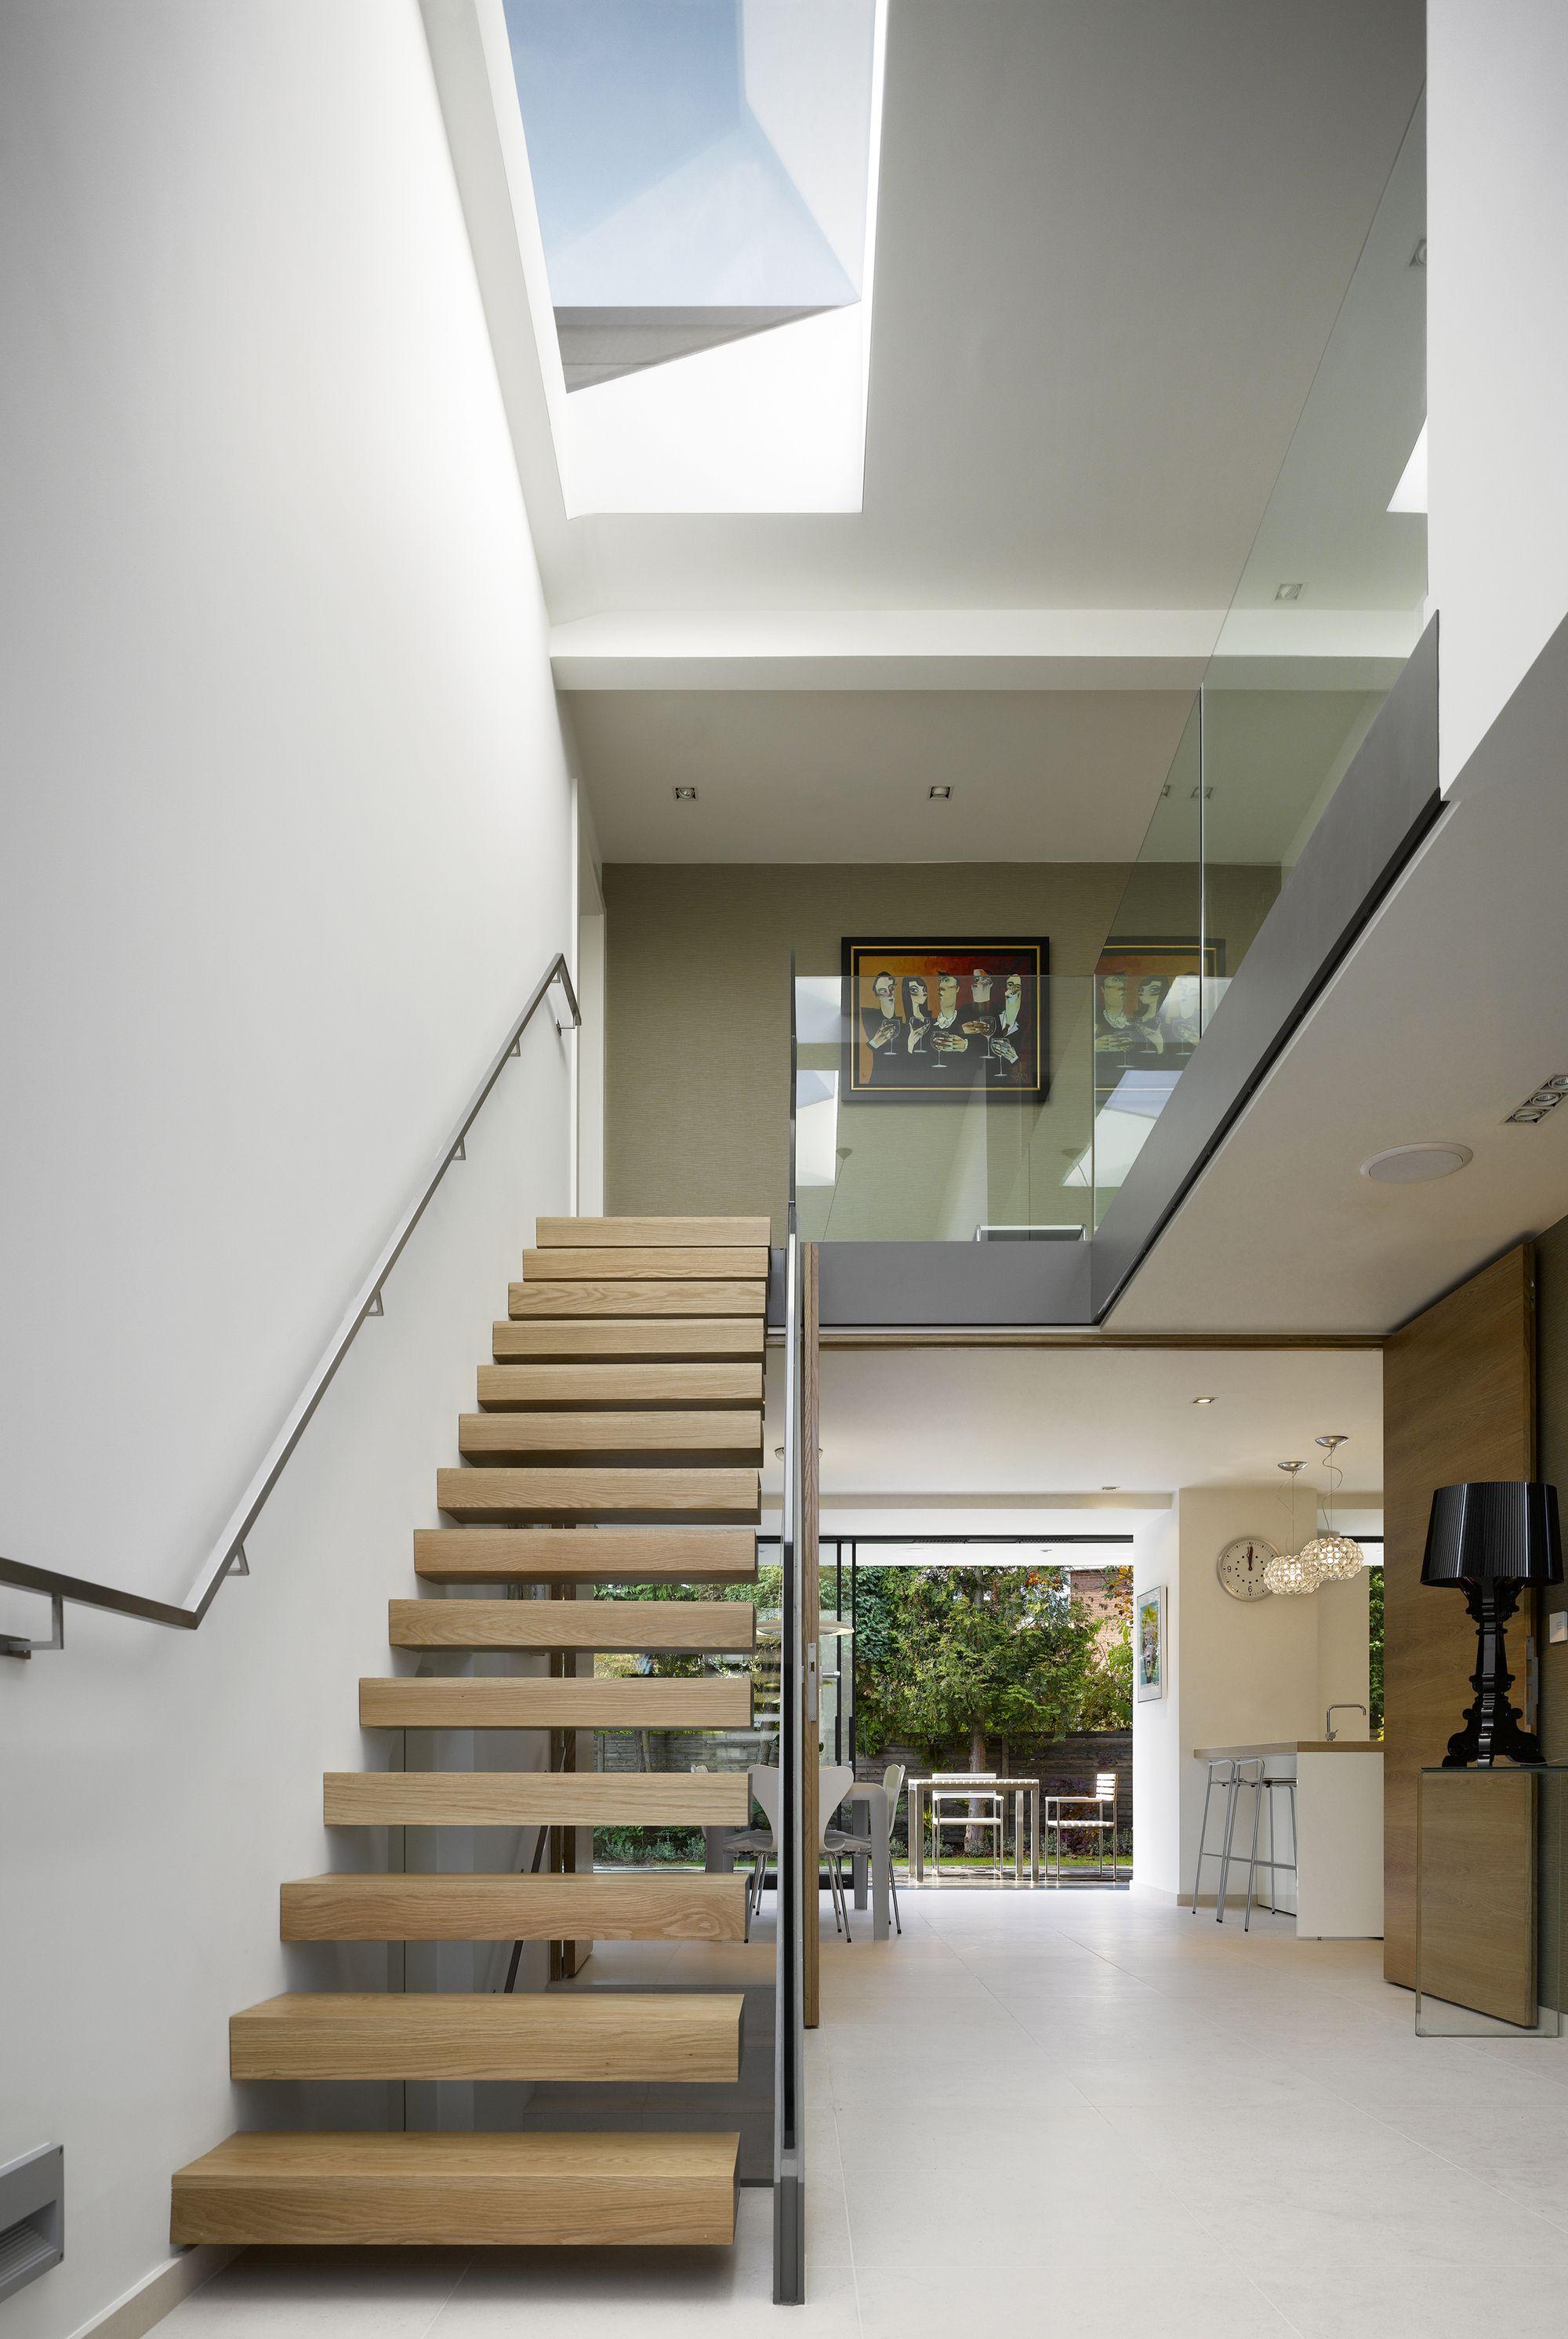 Galer a de house 1005 stephenson isa studio 4 for Escaleras arquitectura